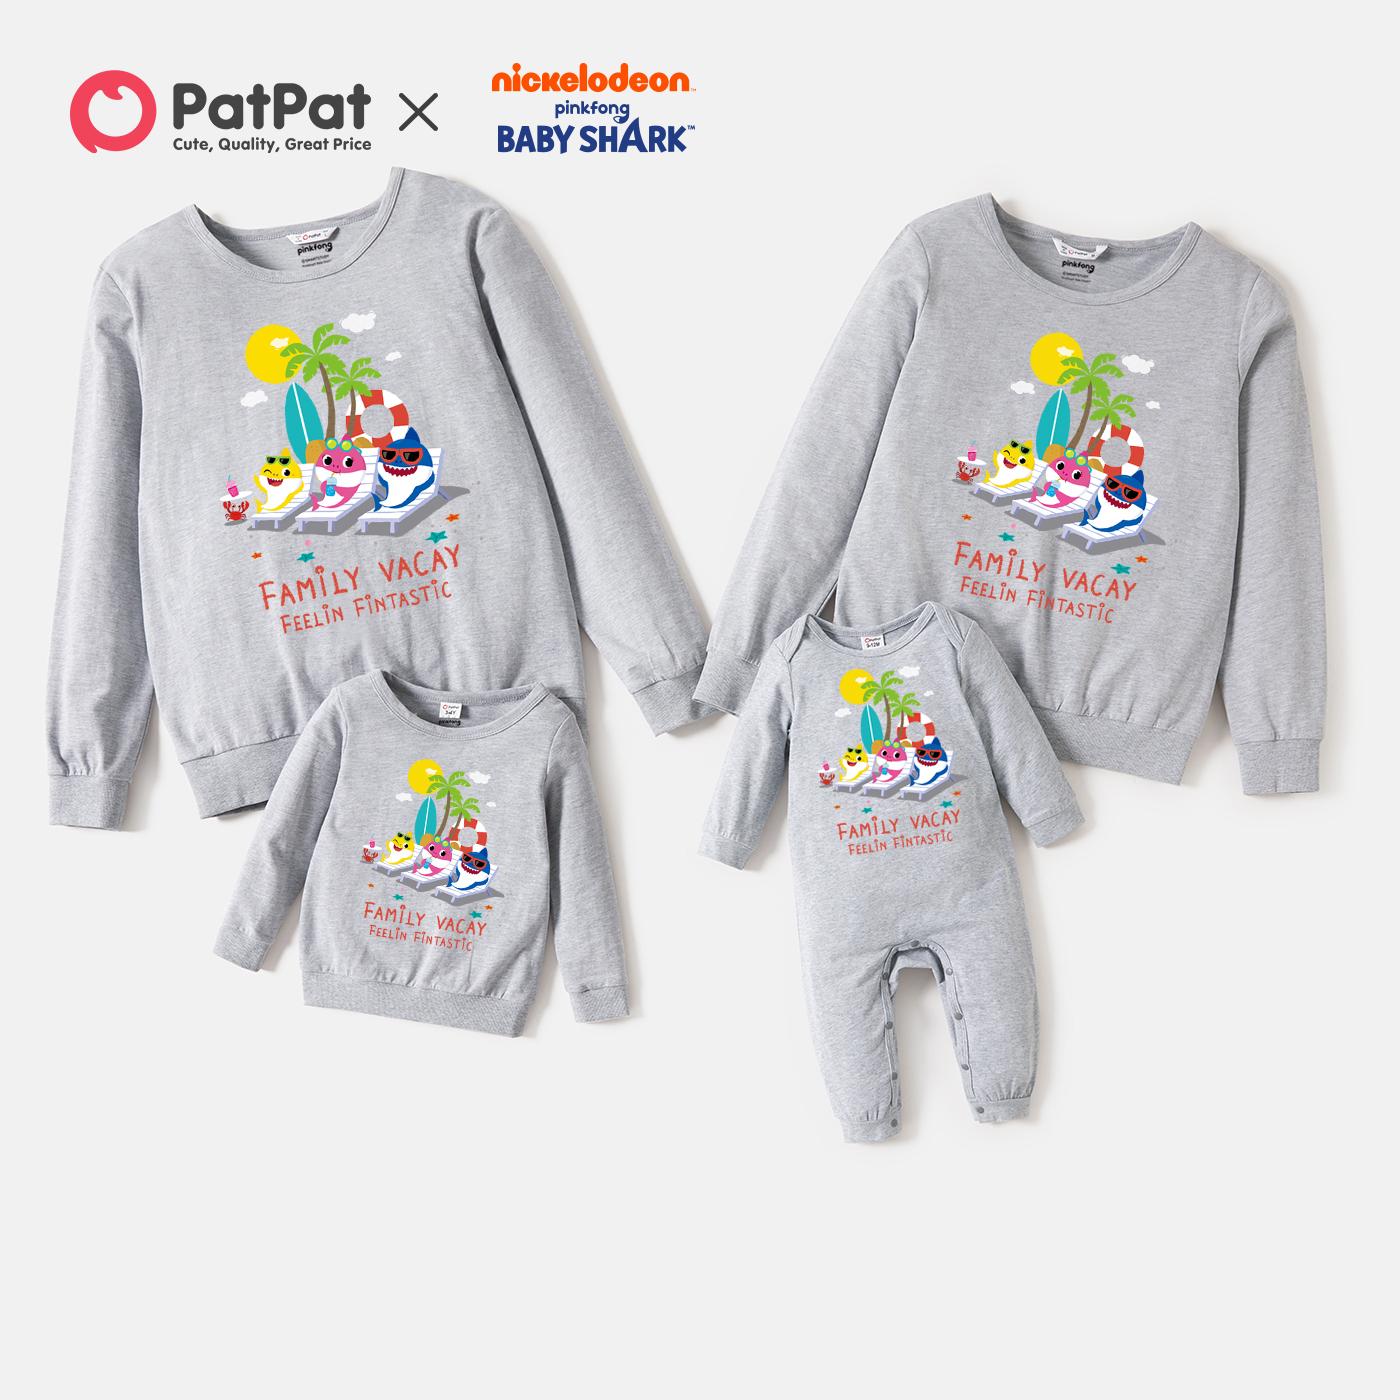 Baby Shark Family Vacay Graphic Cotton Family Matching Sweatshirts